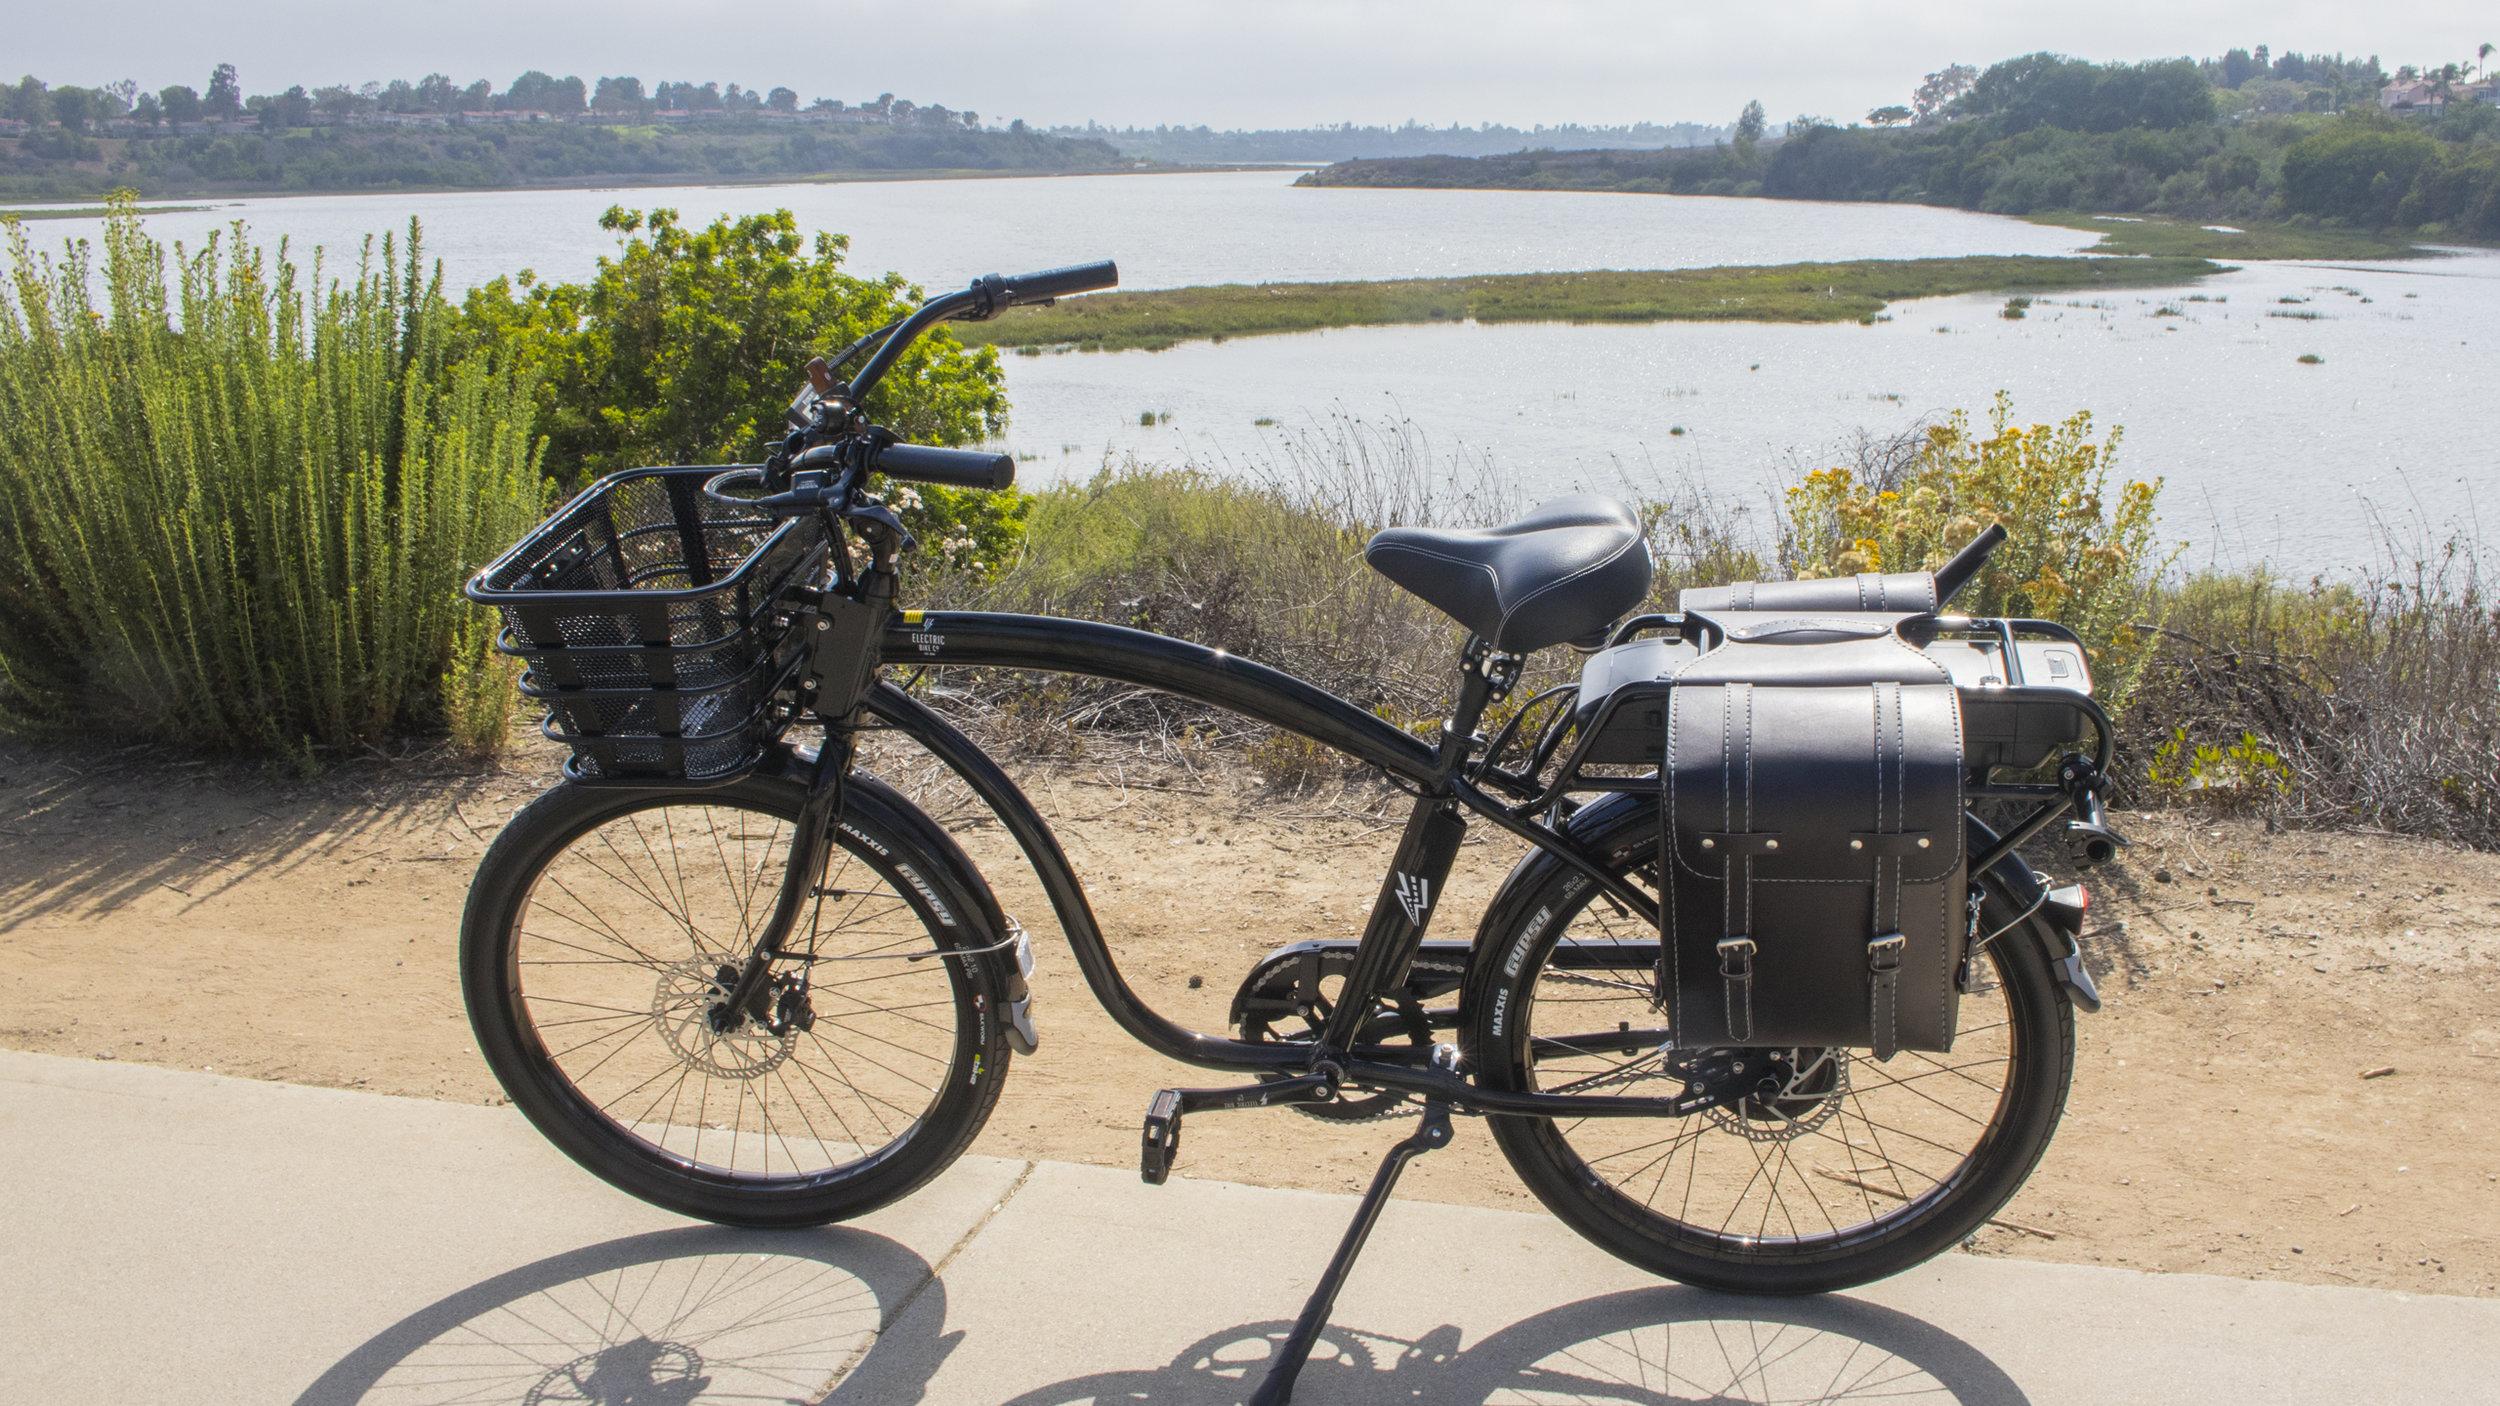 electrified-reviews-electric-bike-company-model-c-electric-bike-review-profile-2.jpg